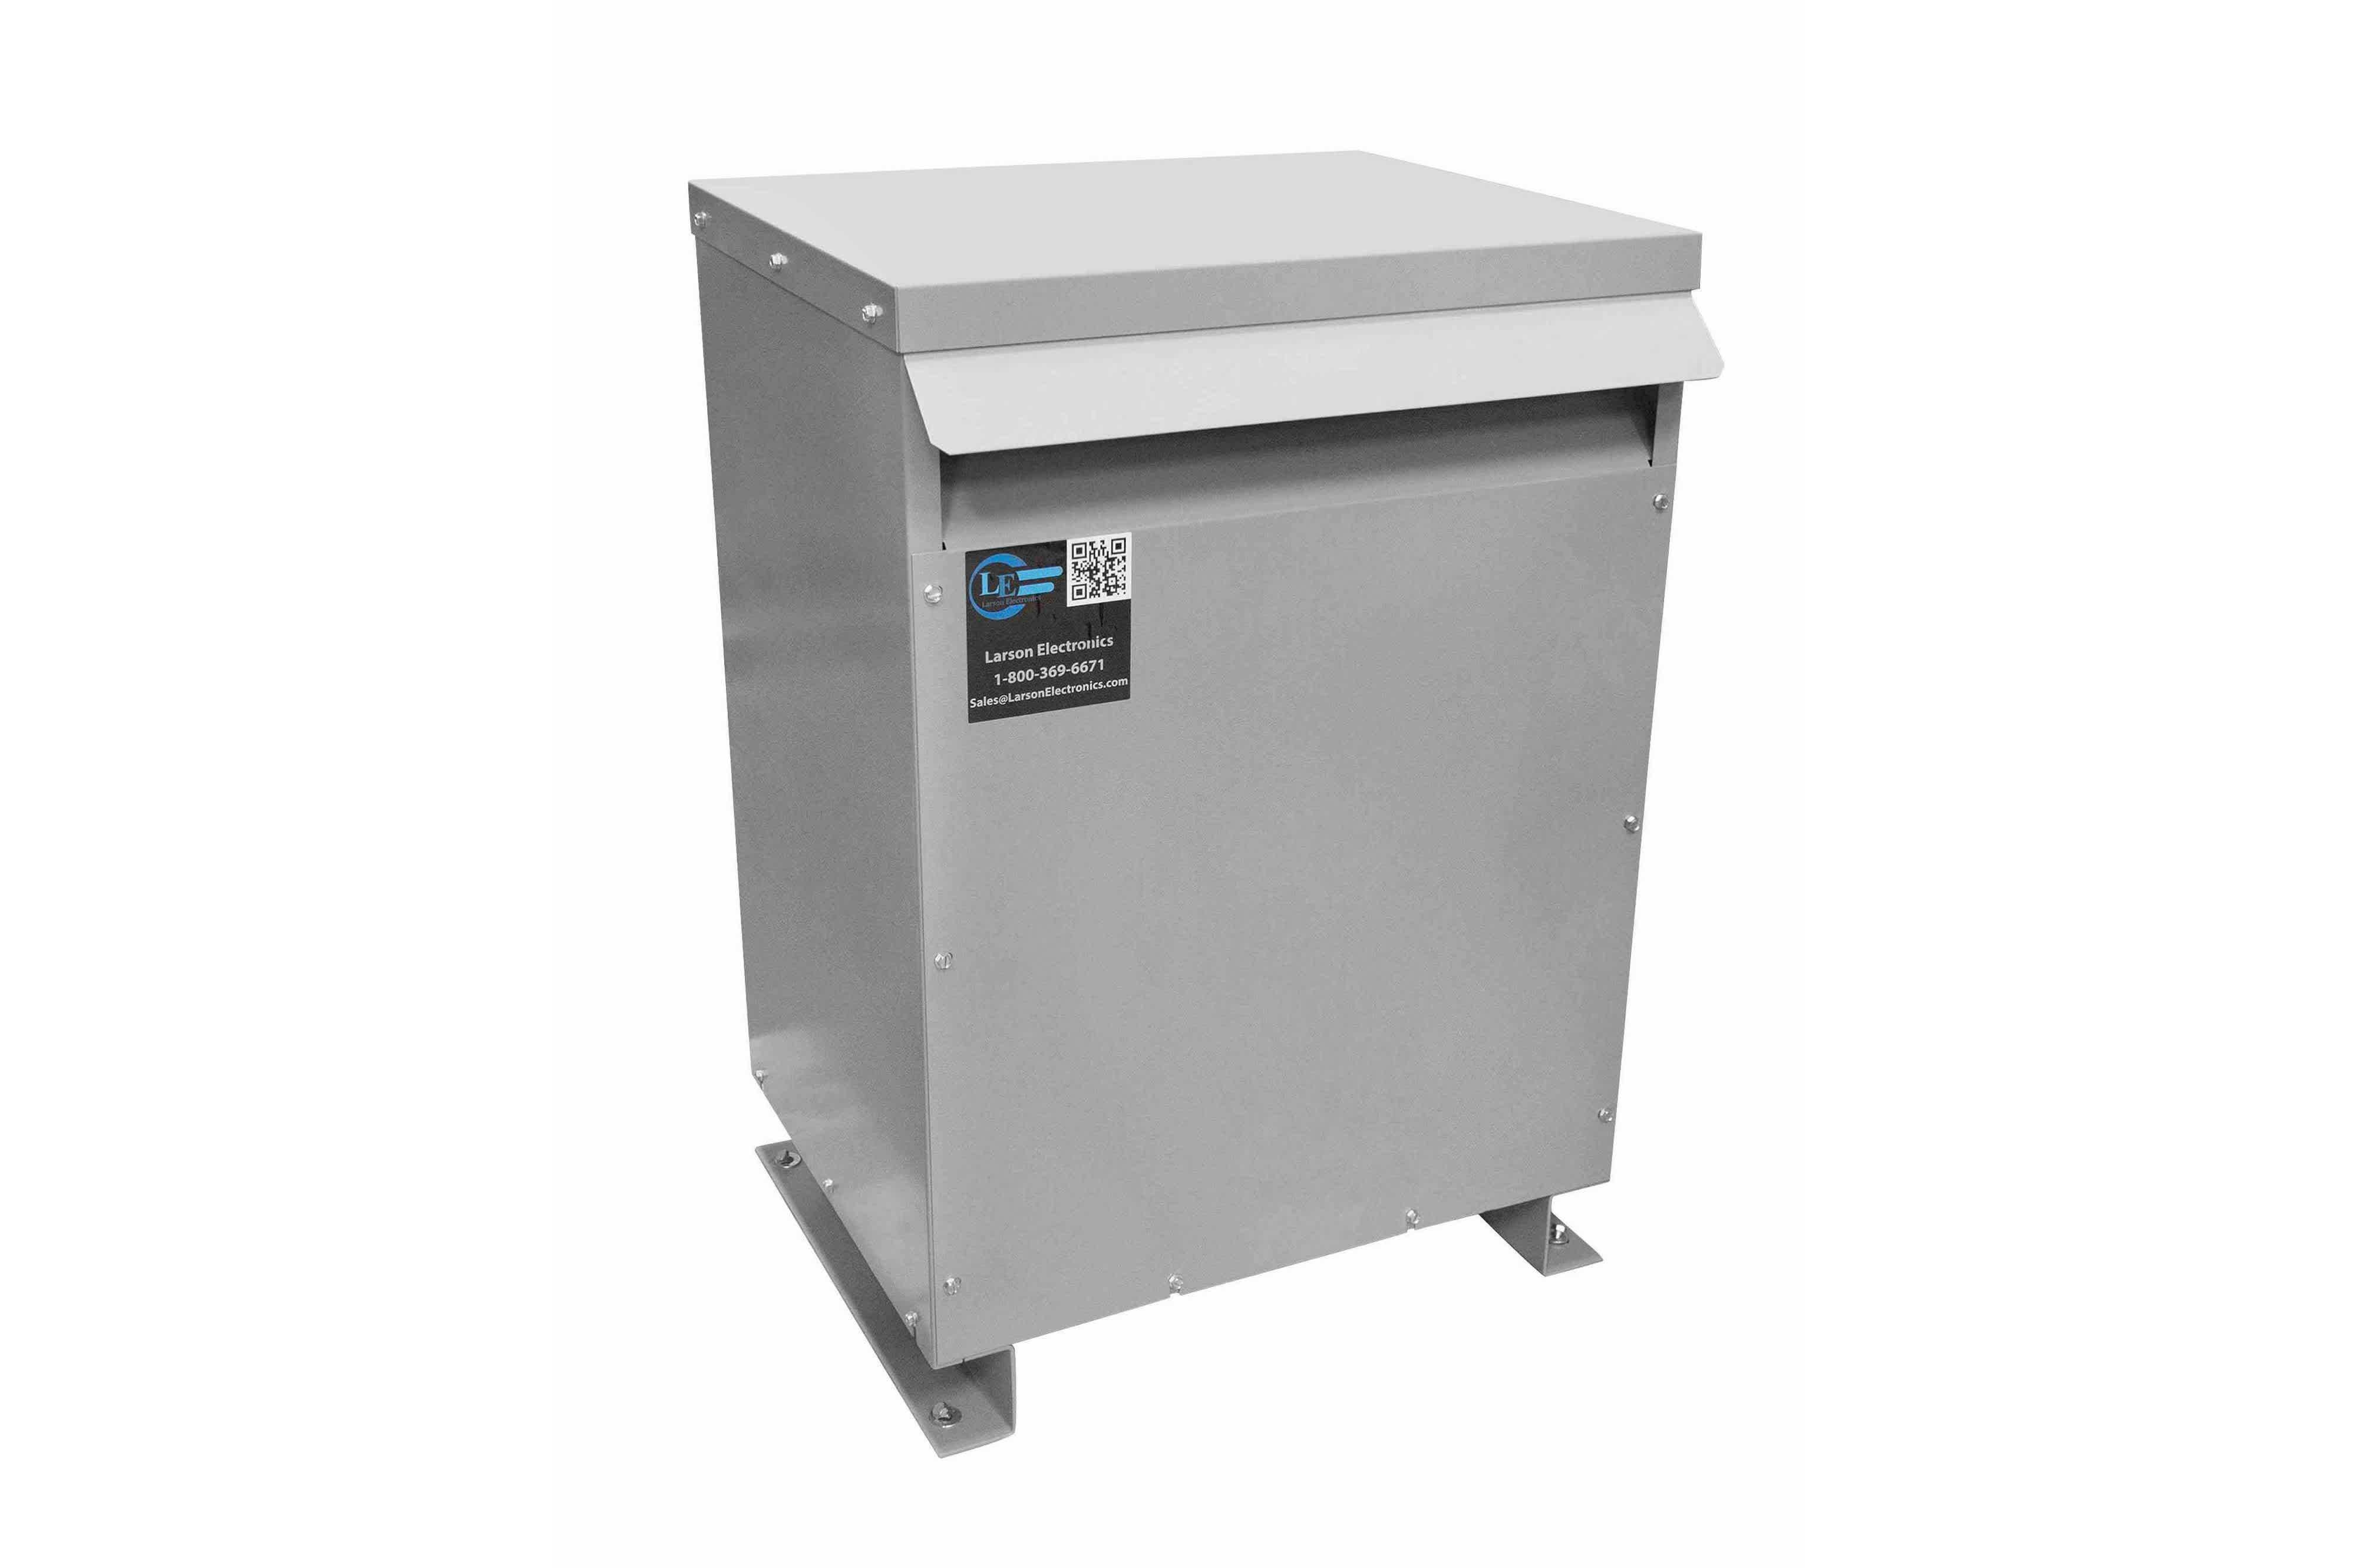 750 kVA 3PH Isolation Transformer, 480V Wye Primary, 600Y/347 Wye-N Secondary, N3R, Ventilated, 60 Hz